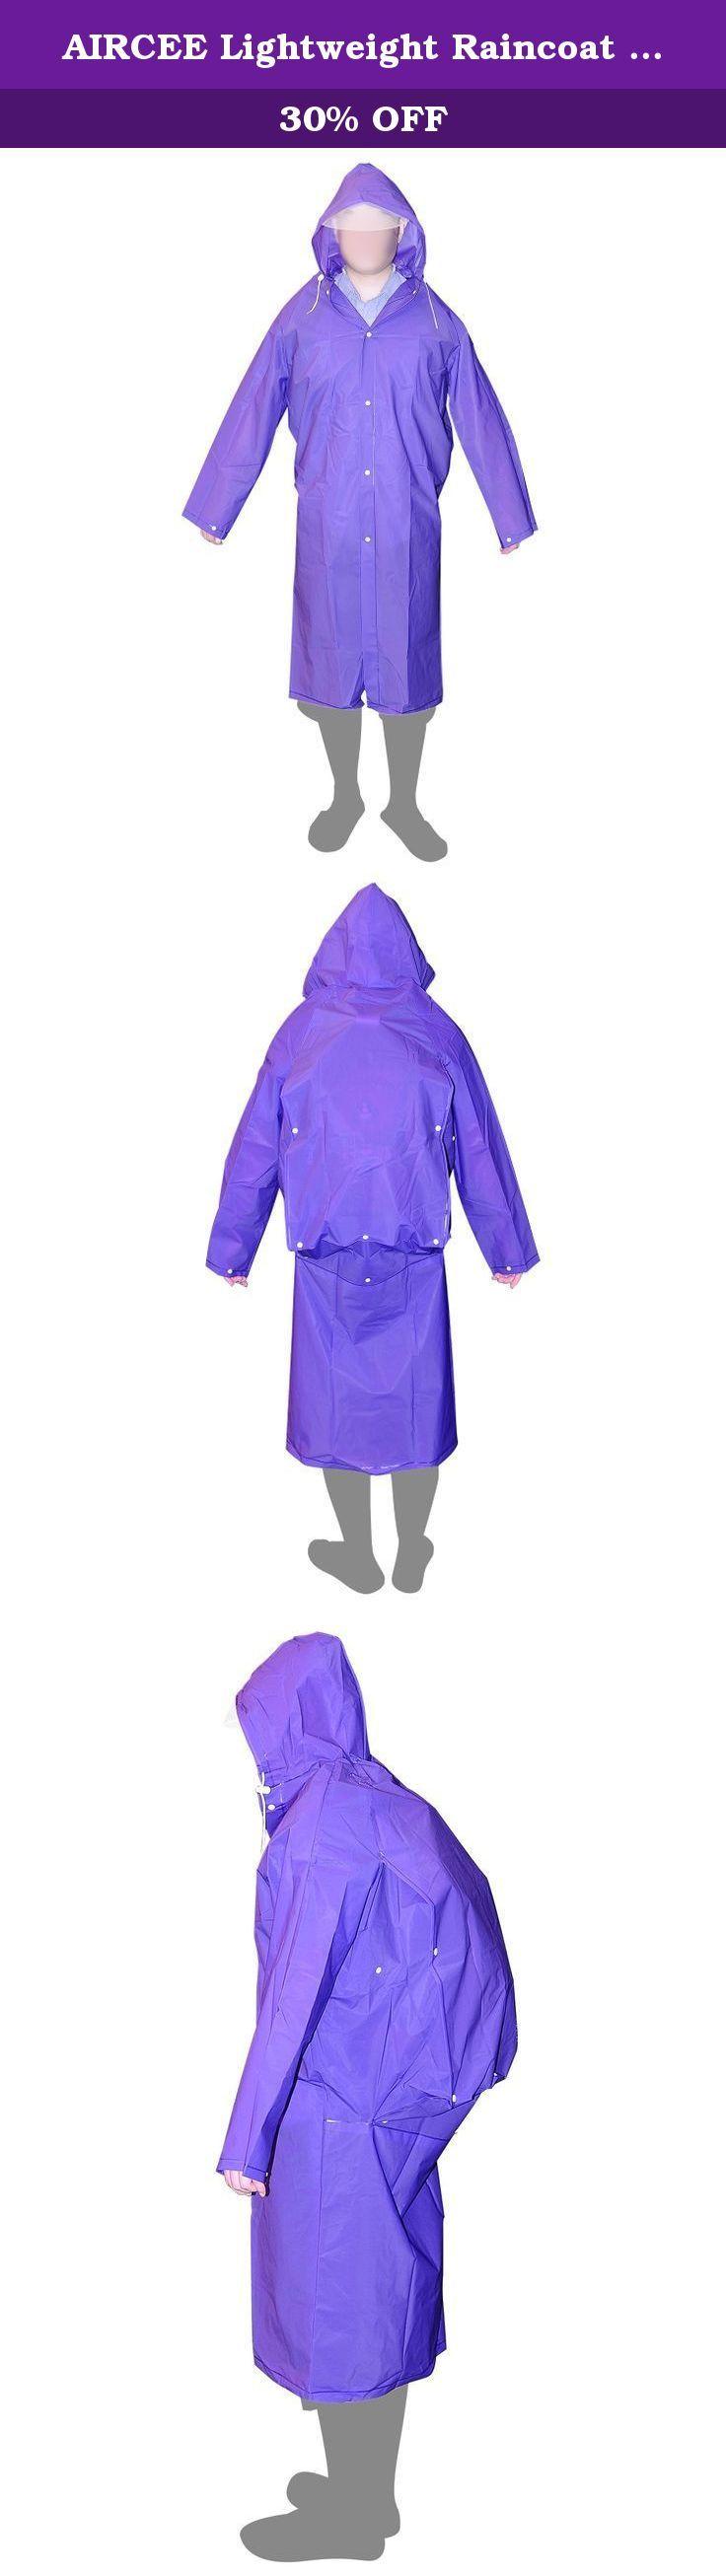 AIRCEE Lightweight Raincoat Rain Cape Poncho /w Backpack Position (Purple). AIRCEE Lightweight Raincoat Rain Cape Poncho /w Backpack Position.